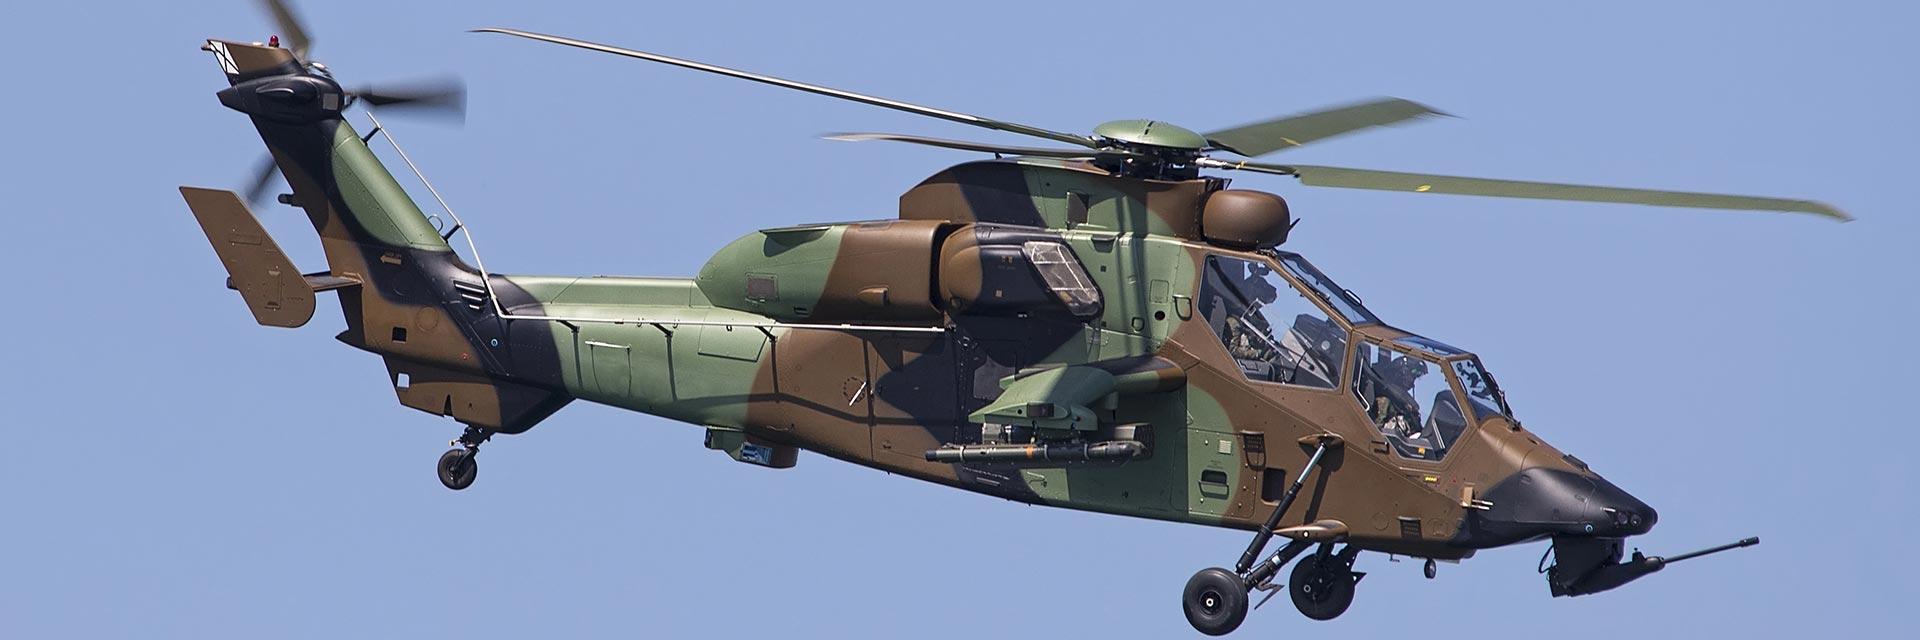 home-aeroform5